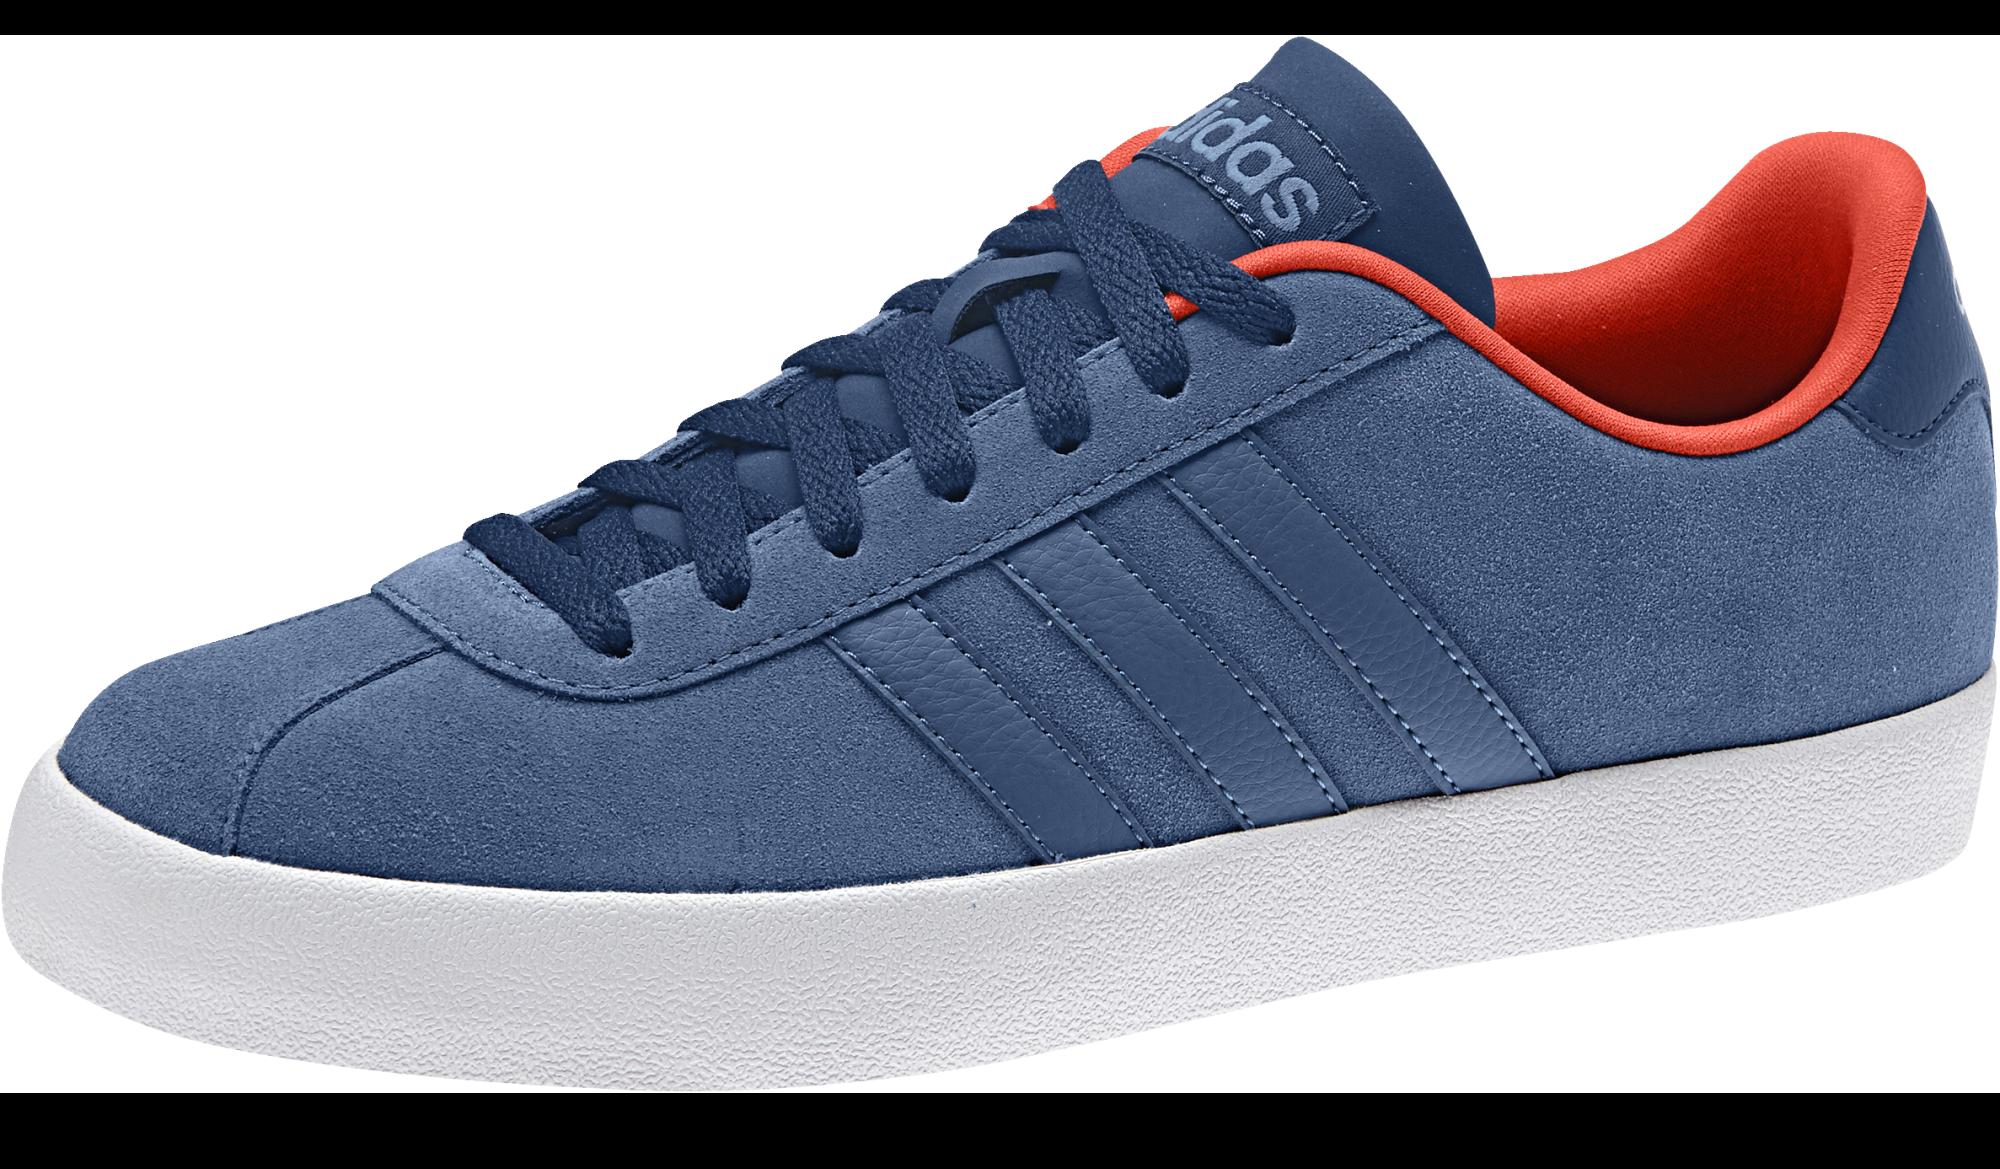 Adidas VL COURT VULC men